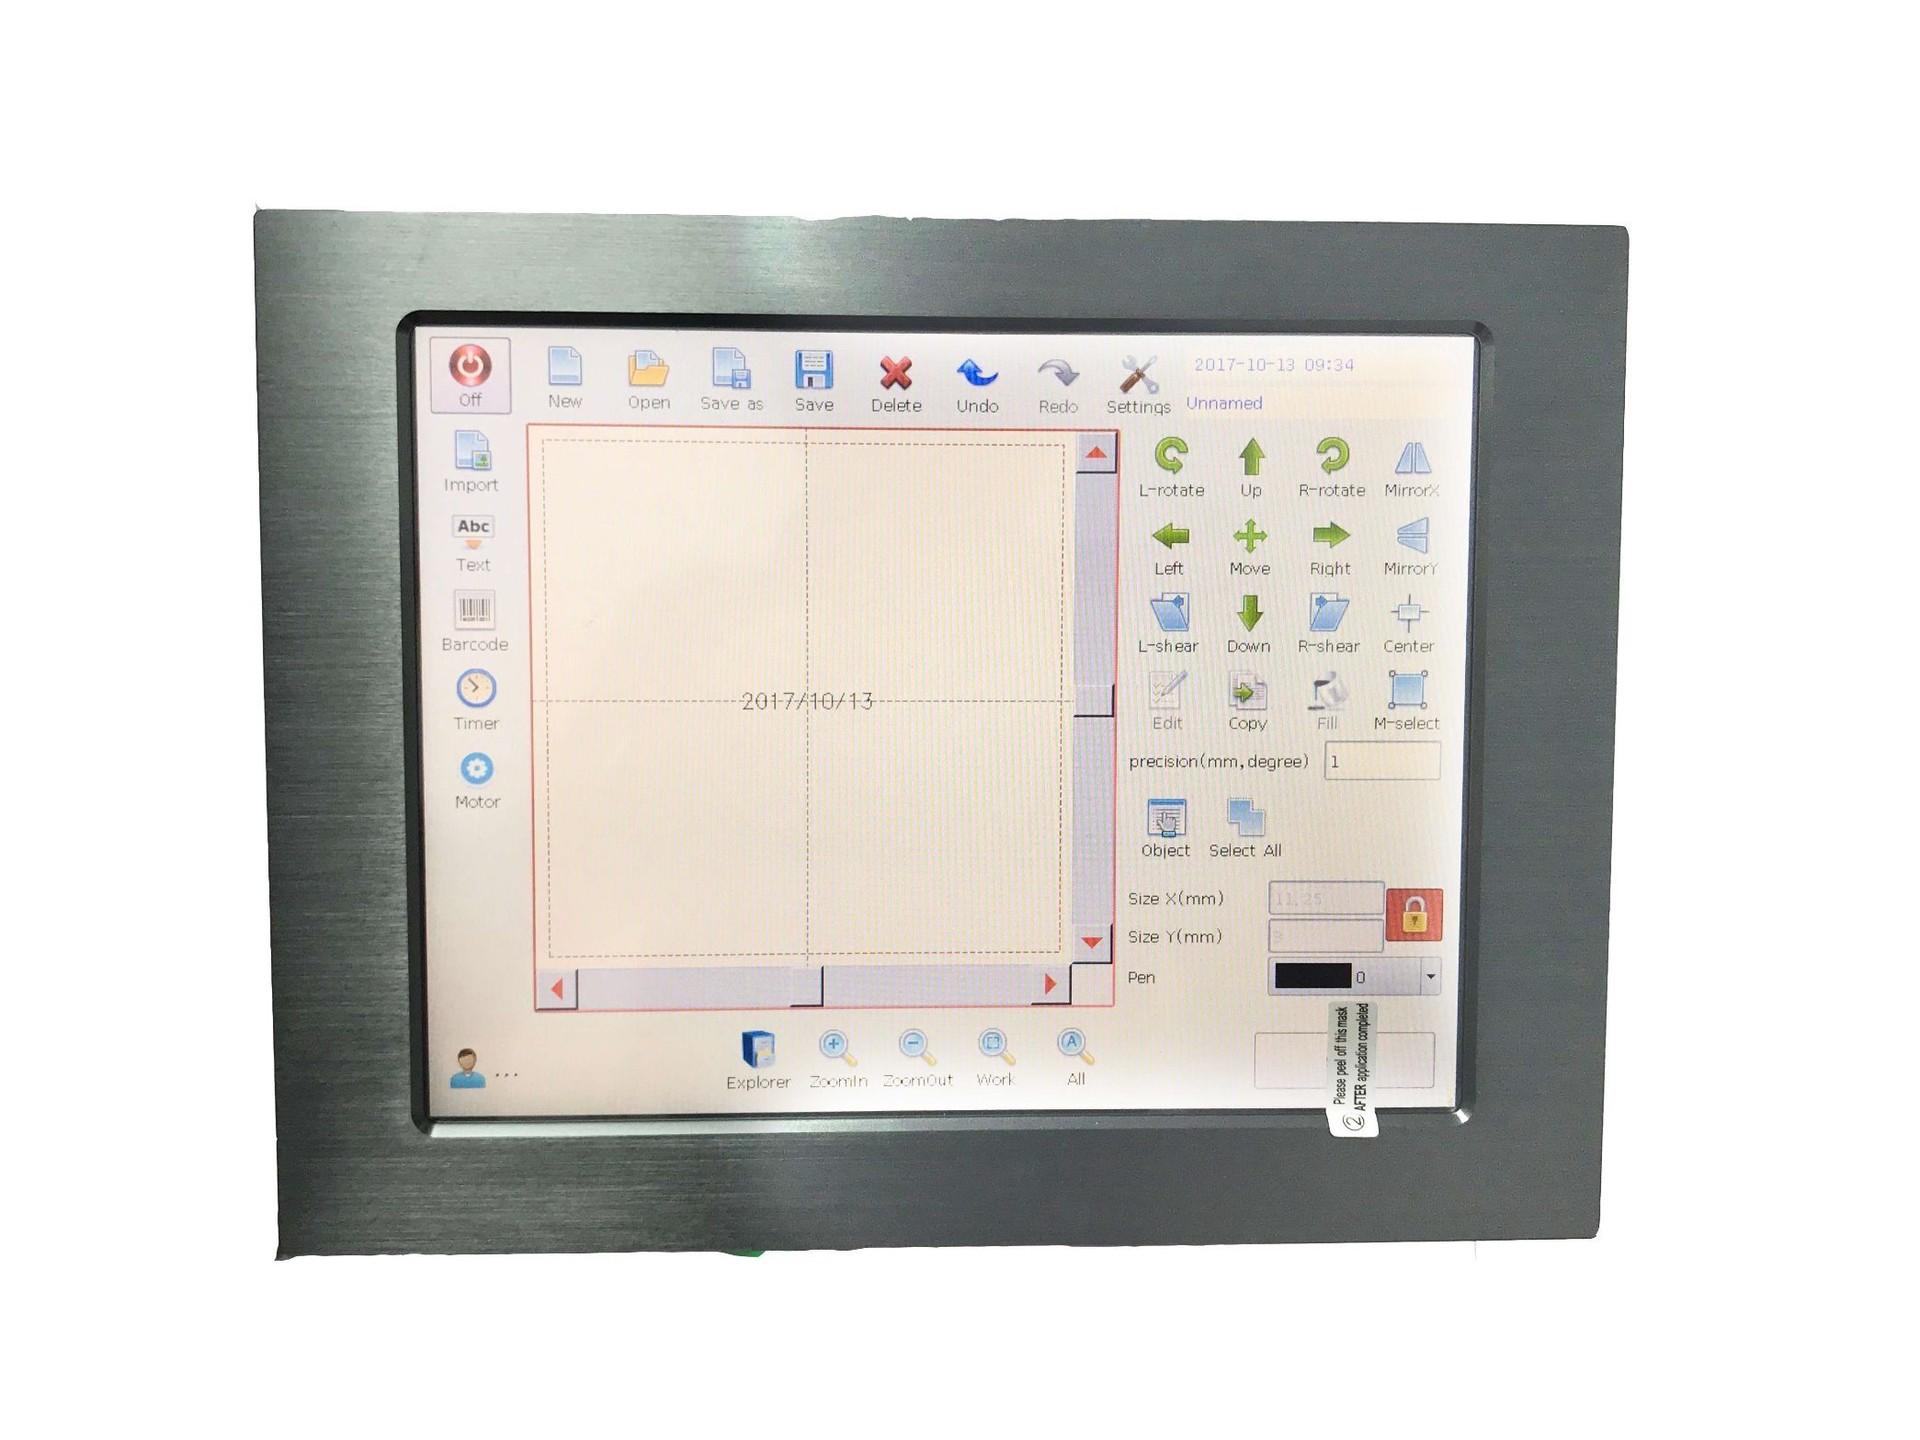 Lead Tech Lt8003u/Lt8005u UV 3W/5W High Precision Laser Engraving Printer for Stainless Steel Metal Plate Silver Gold